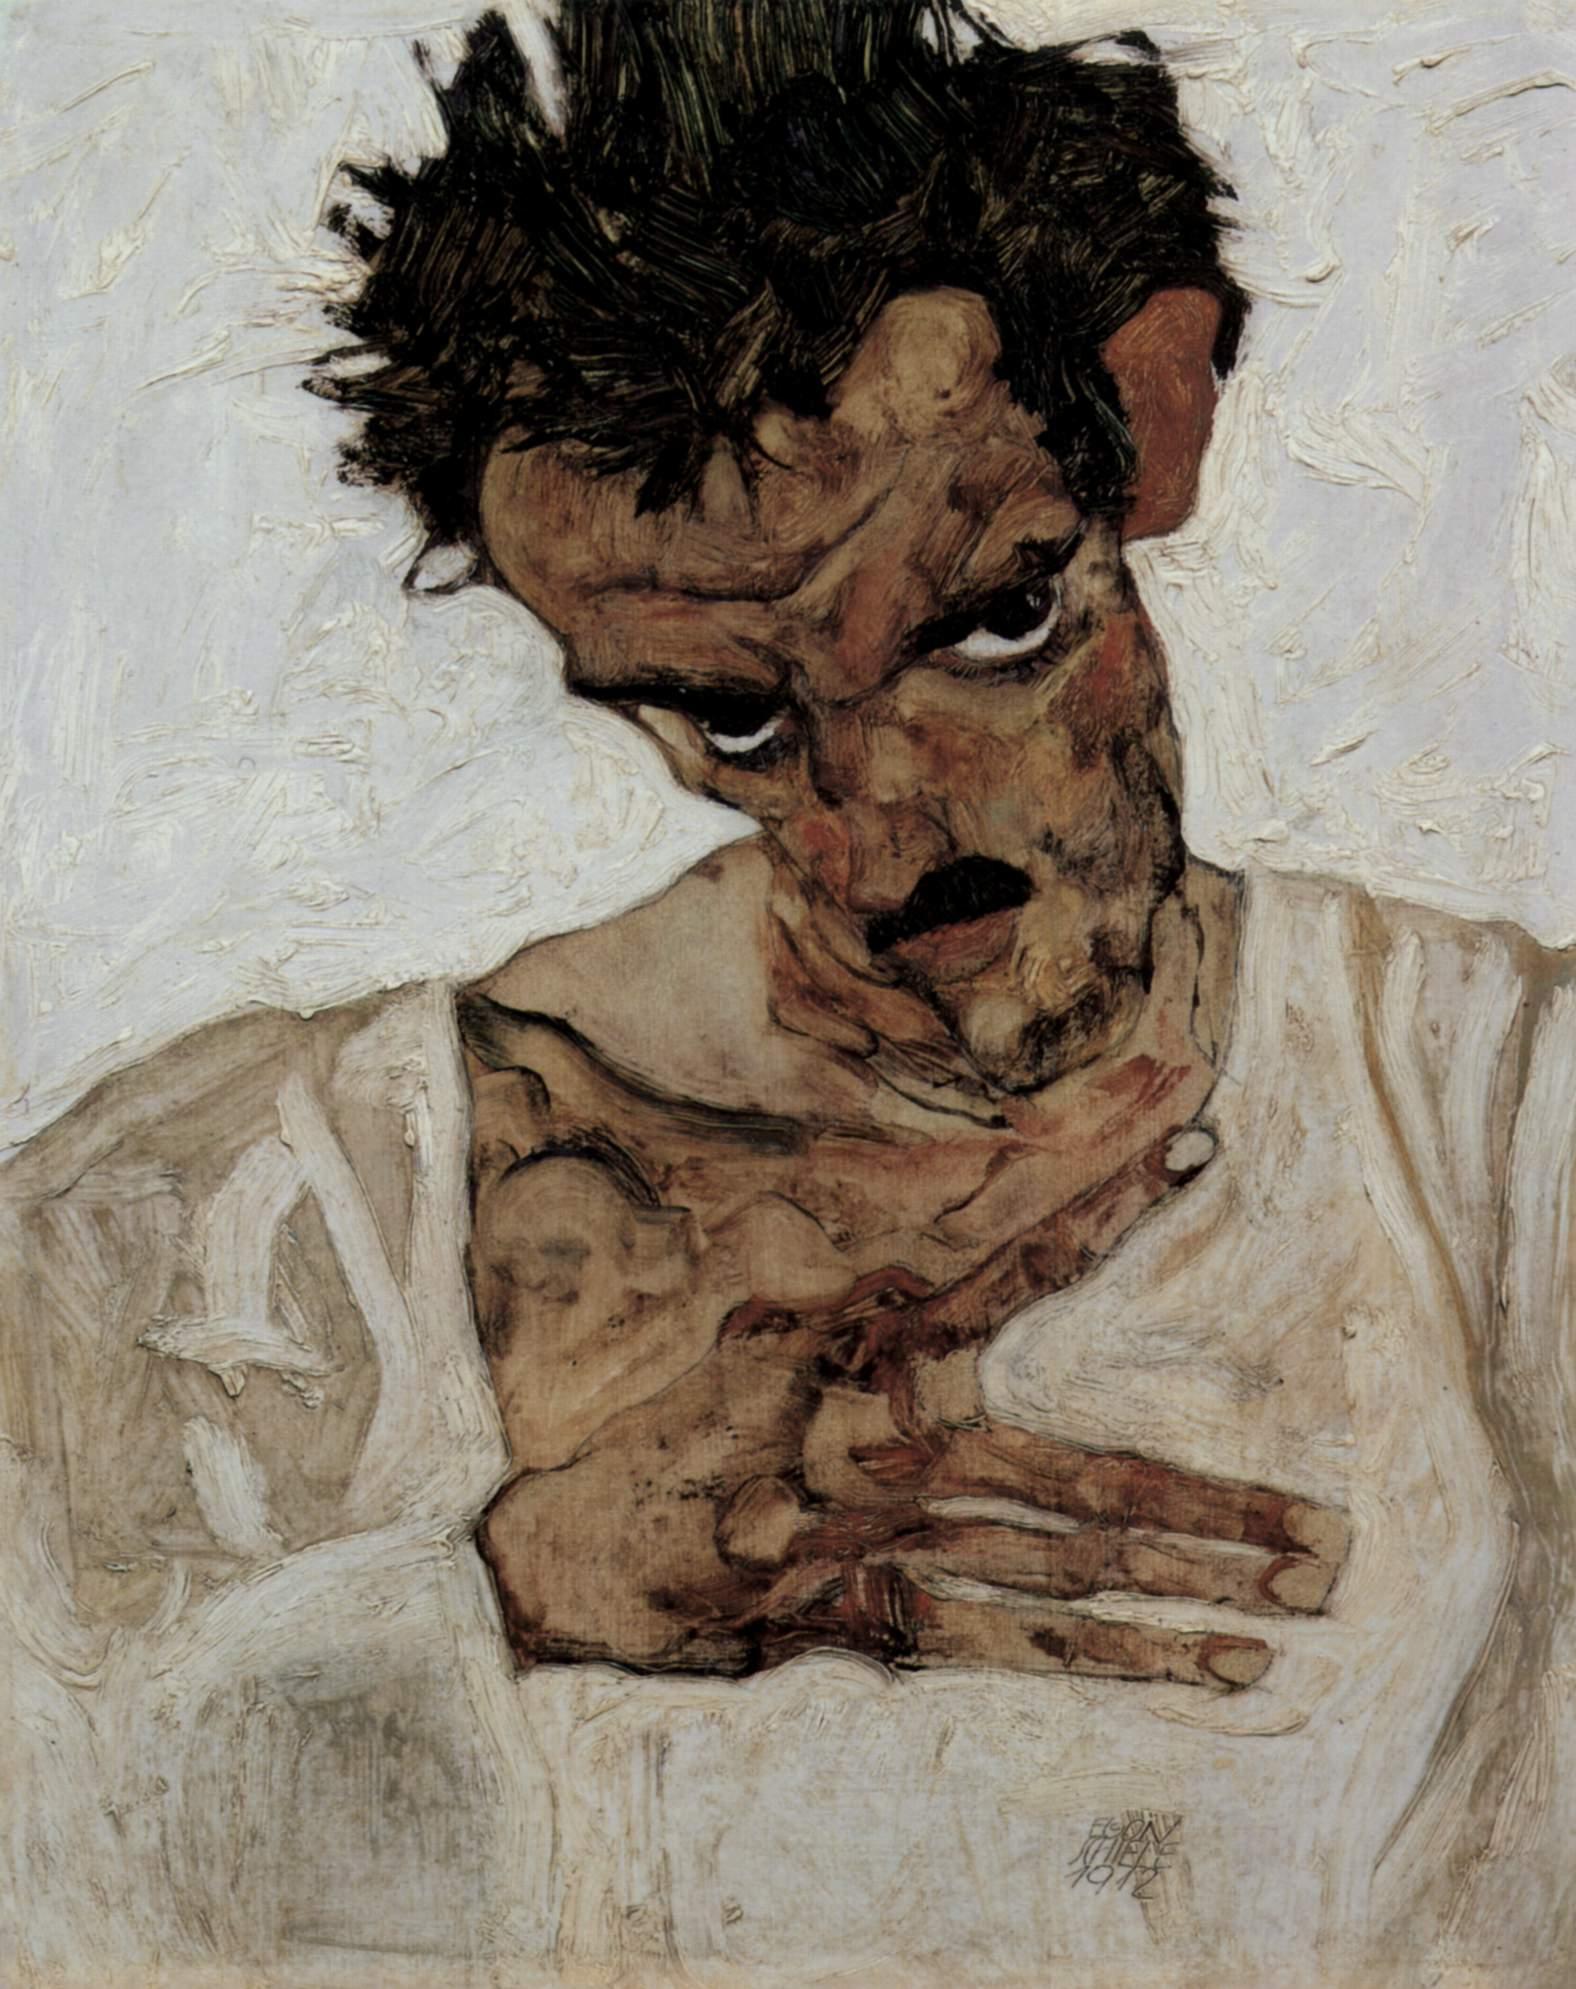 Self-Portrait, Egon Schiele, 1912 (Image courtesy of Leopold Museum)